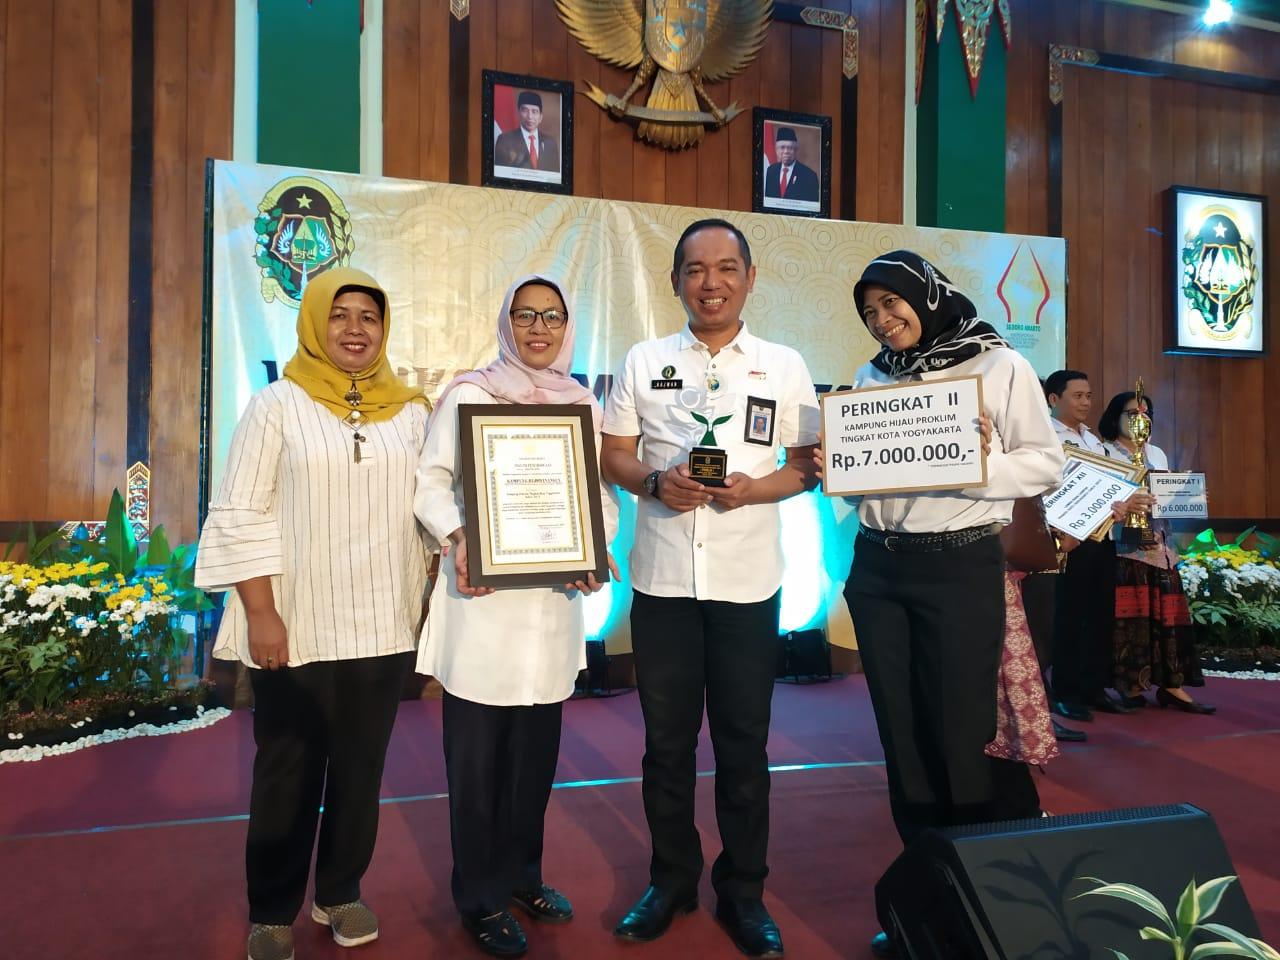 RW 08 Kelurahan Rejowinangun memperoleh Juara 2 Lomba Proklim se- Kota Yogyakarta